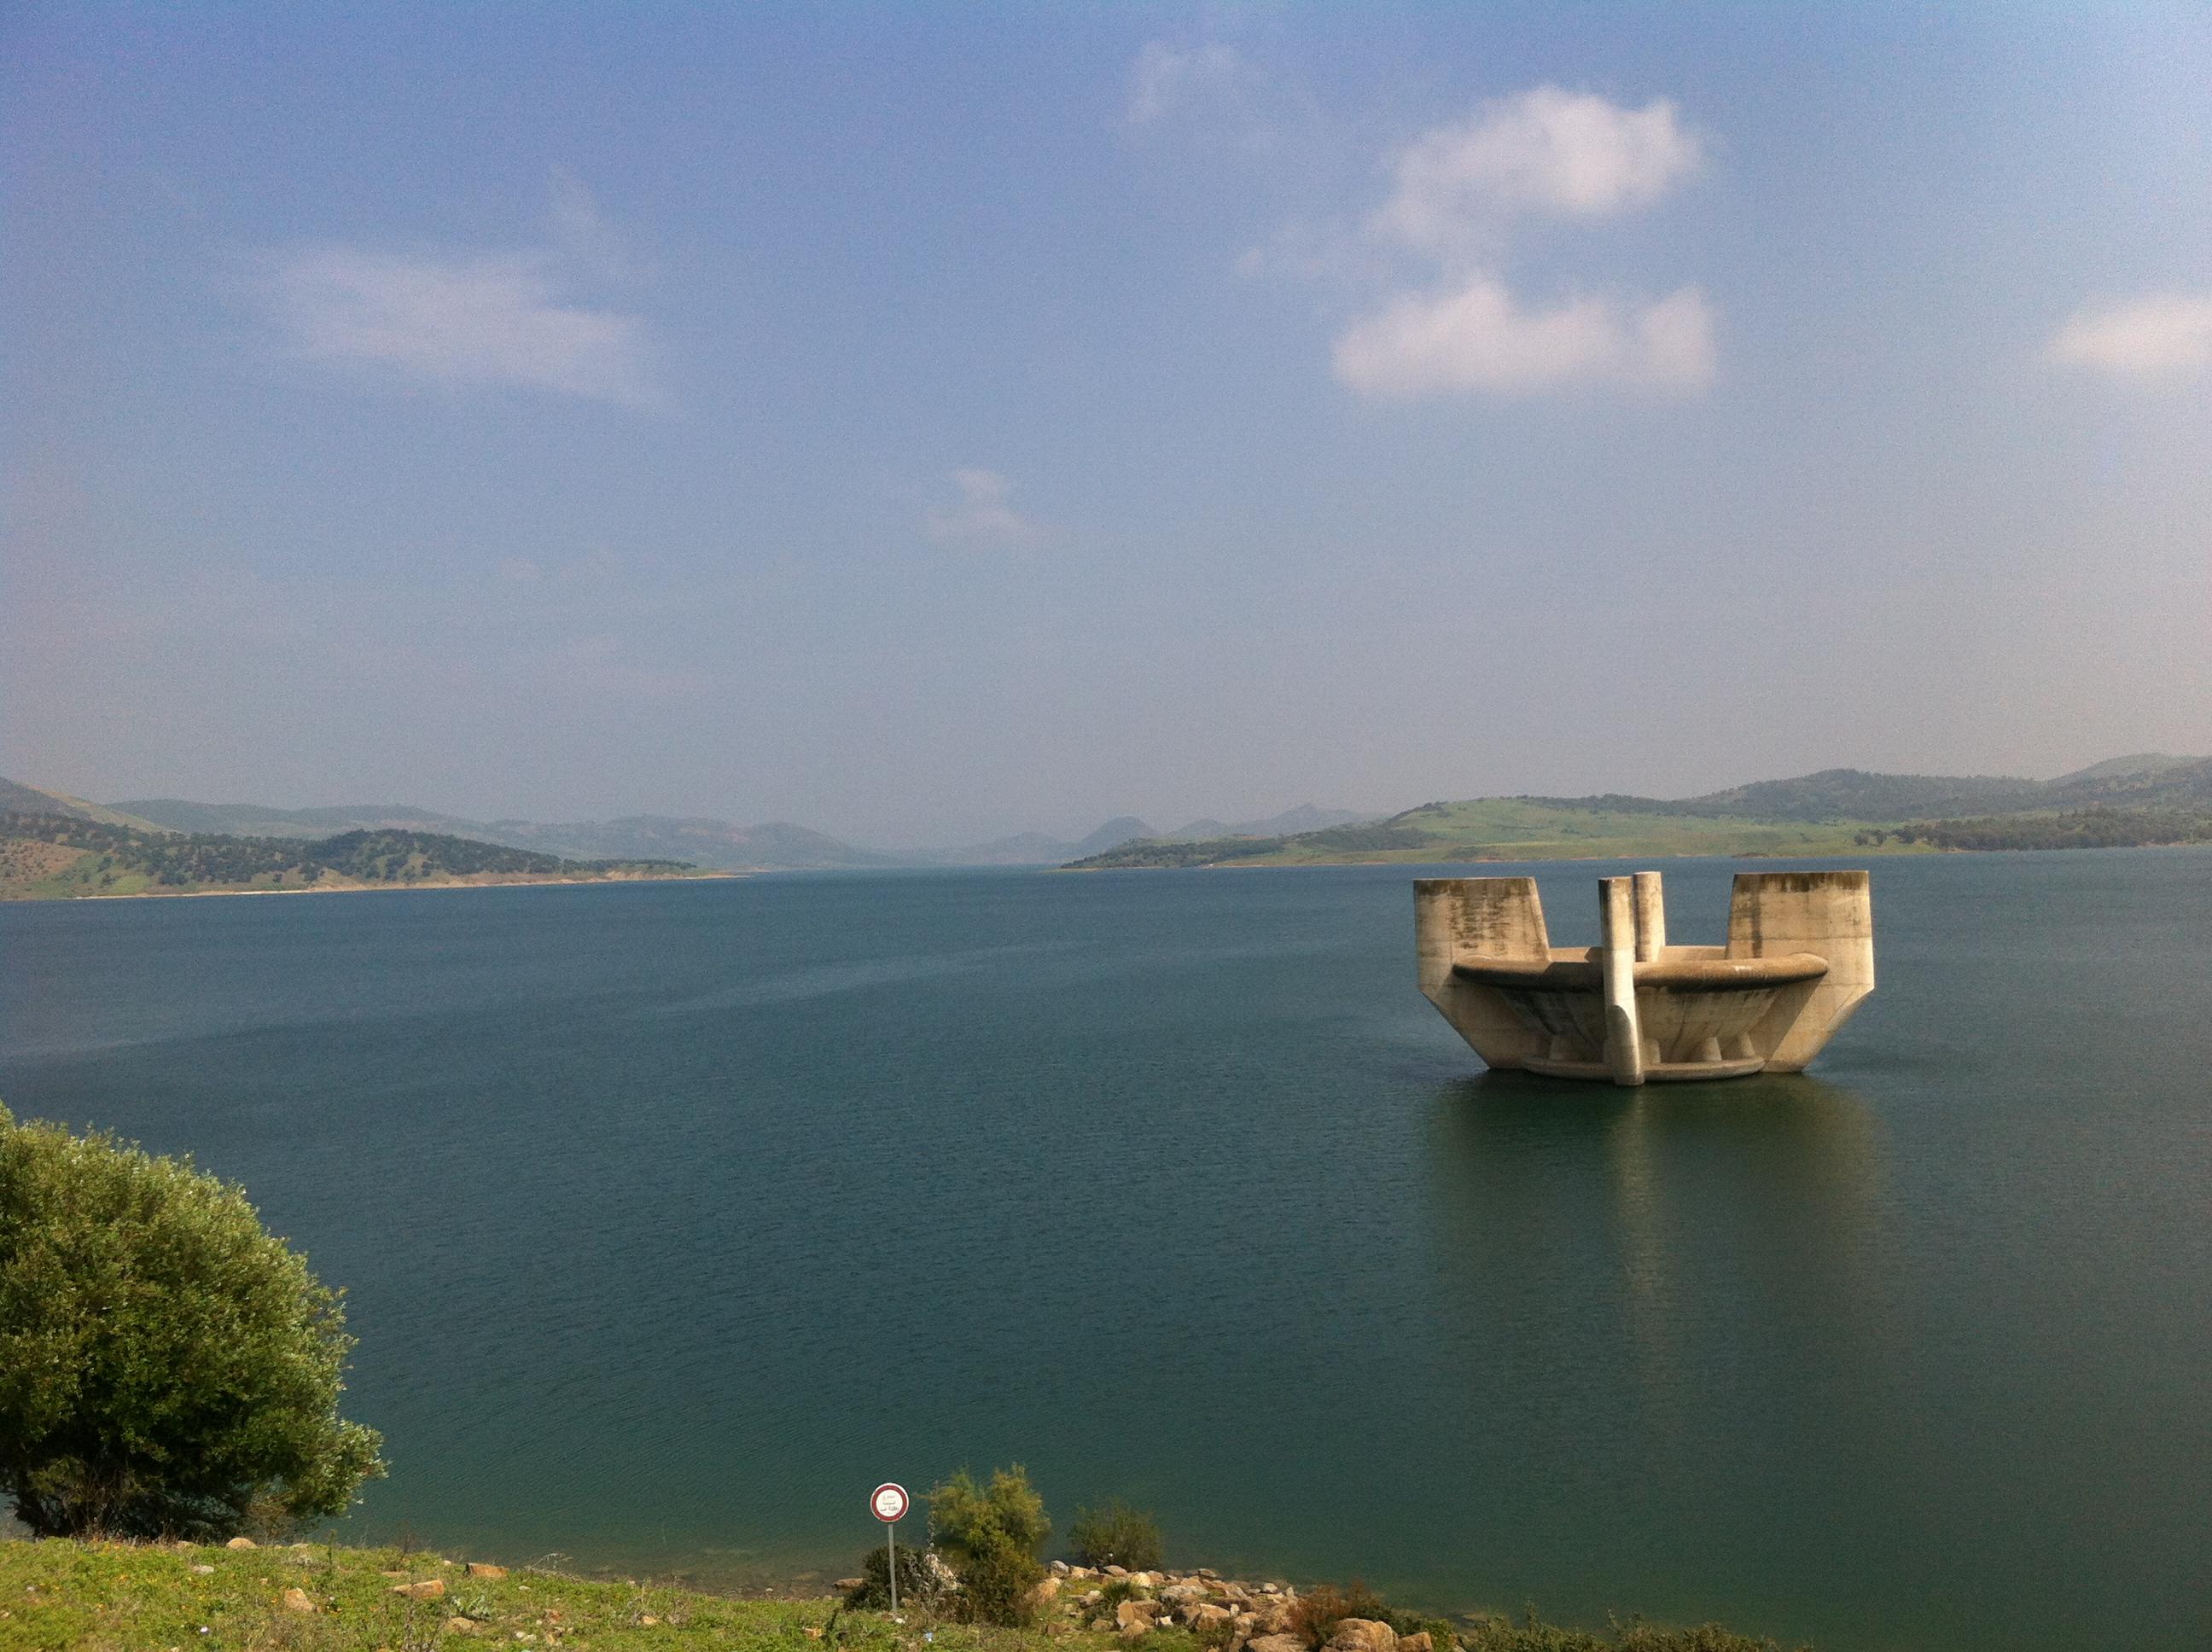 Tanger-Tétouan-Al Hoceima: Les barrages à flot